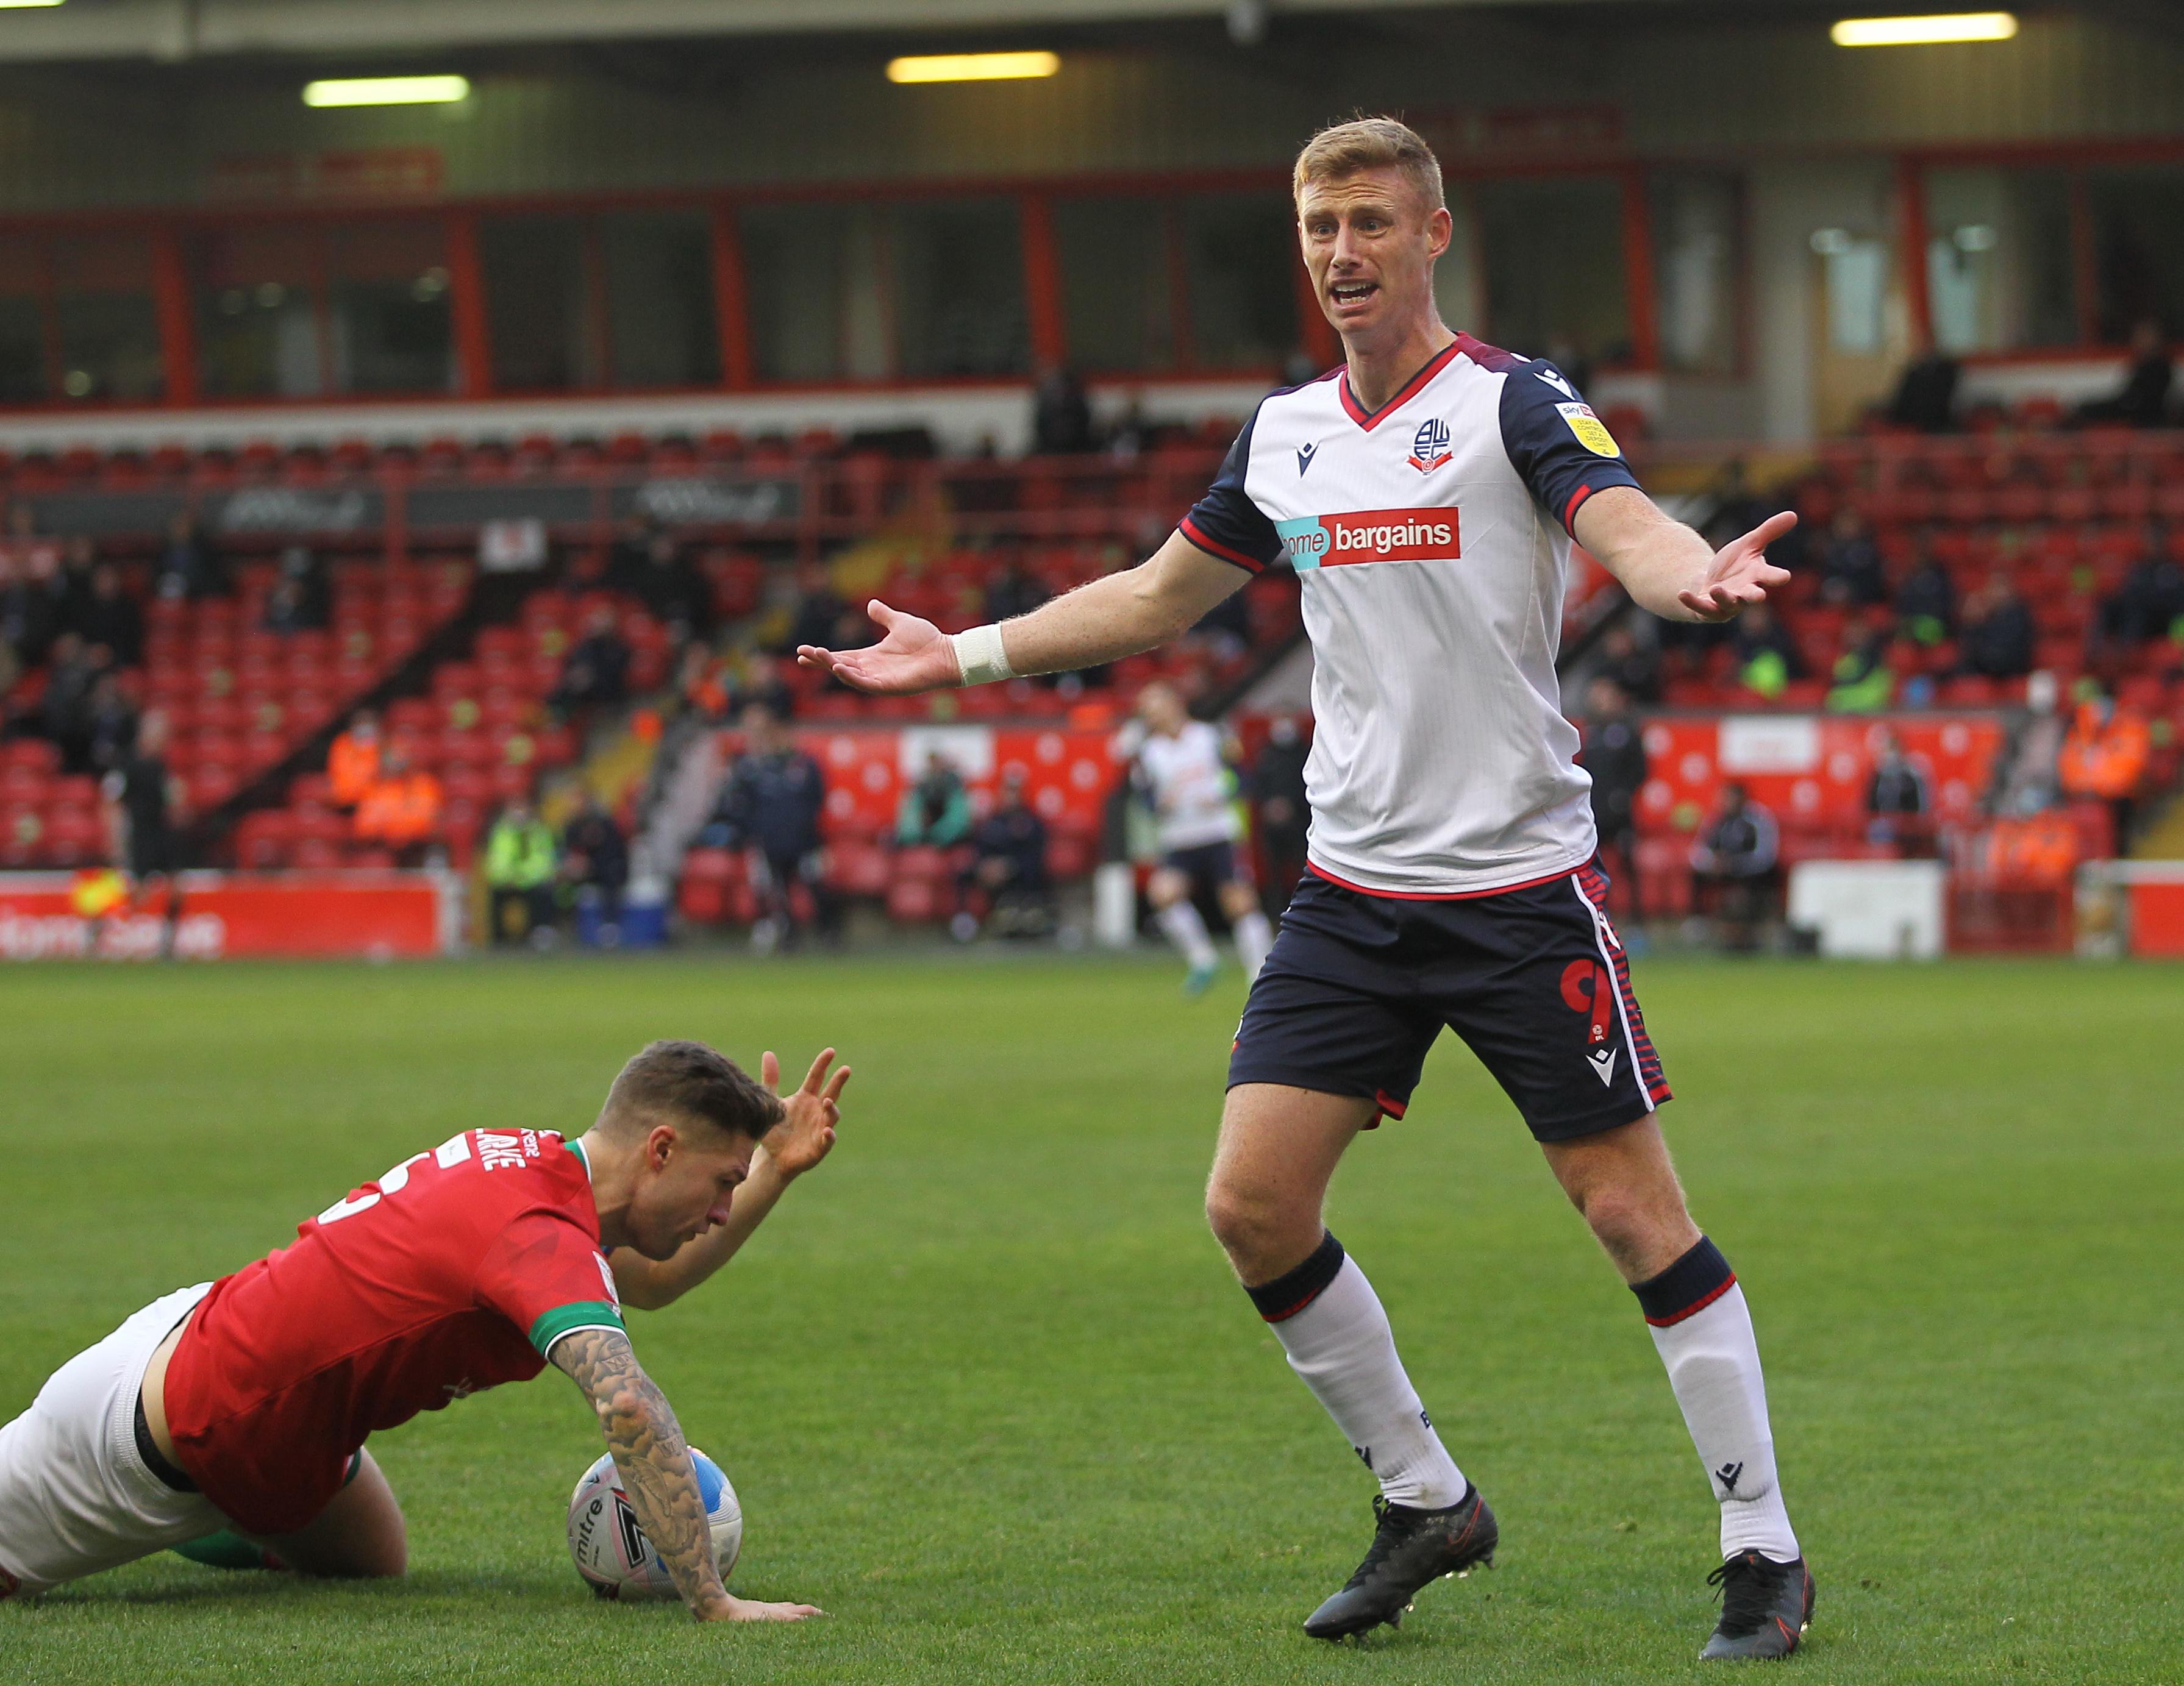 Walsall v Bolton Wanderers - Sky Bet League Two